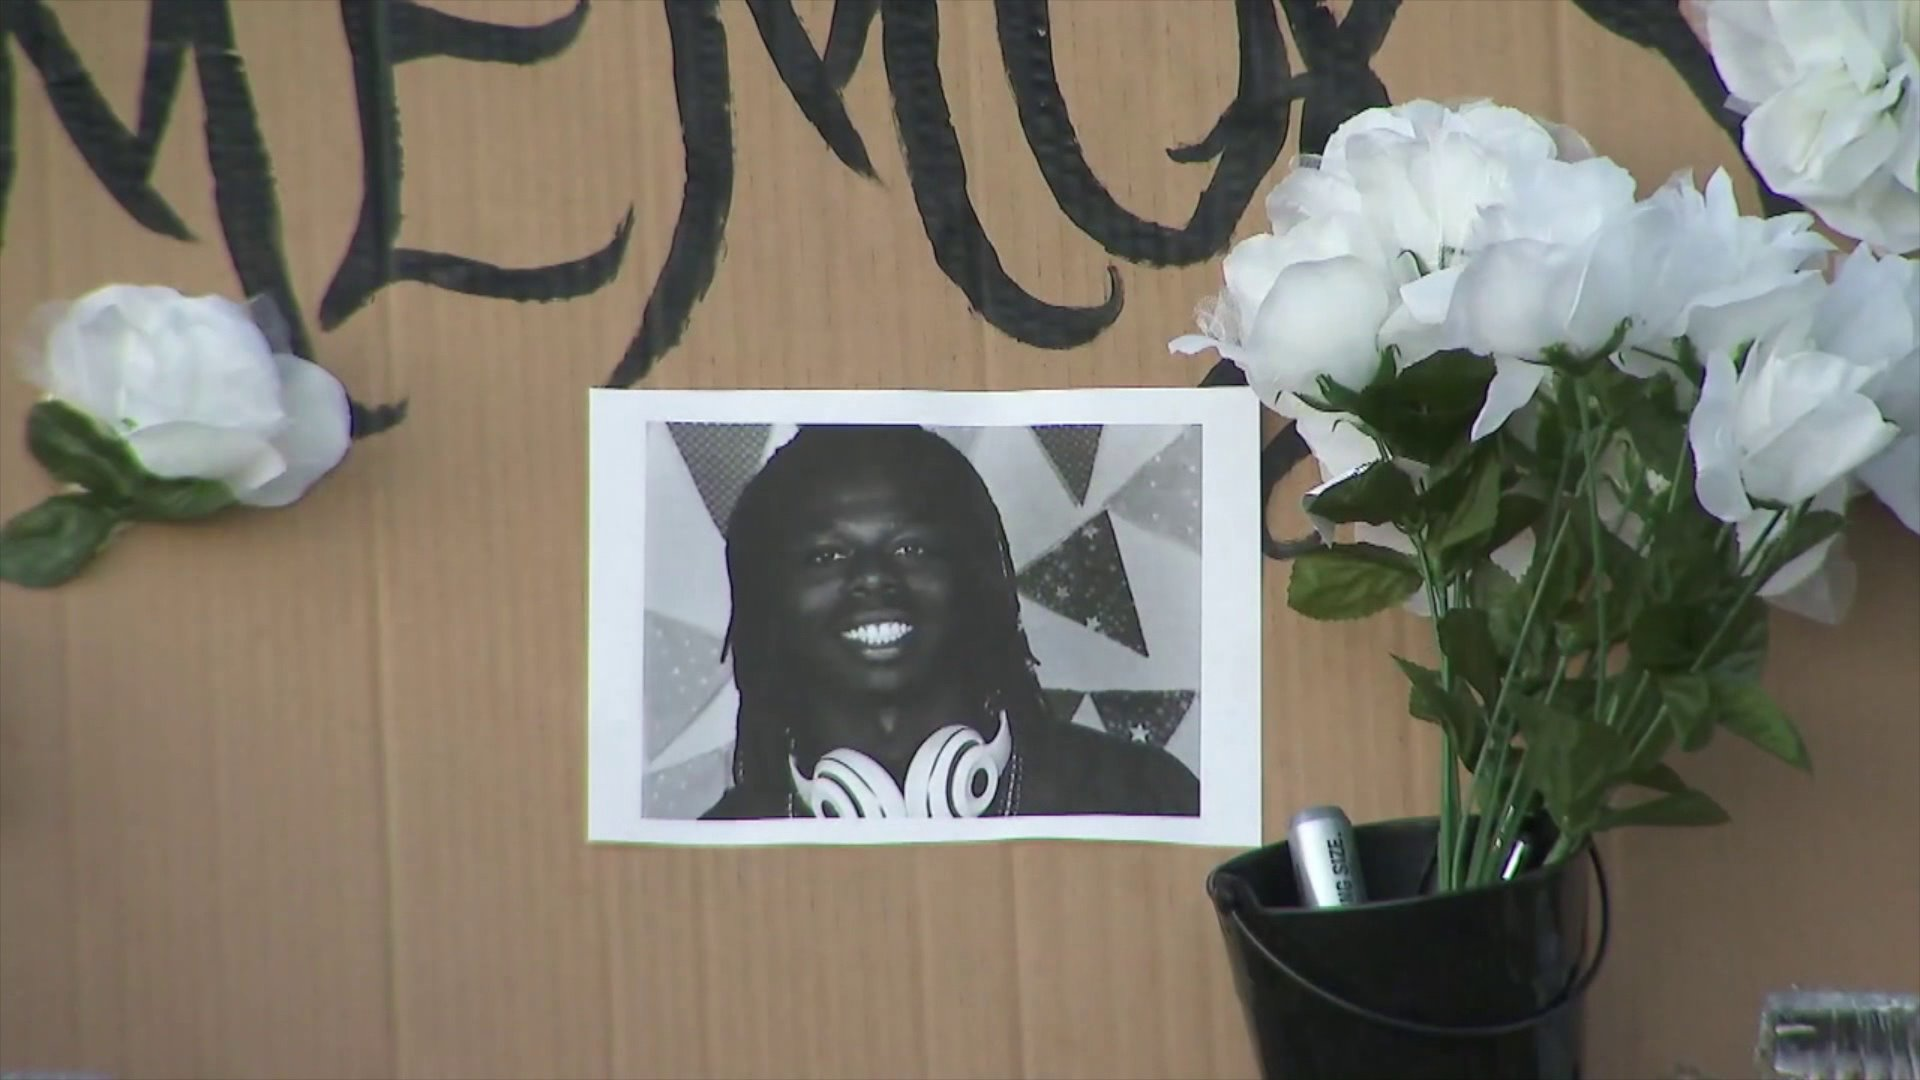 A memorial is held for Robert Fuller in Santa Clarita on June 20, 2020. (KTLA)